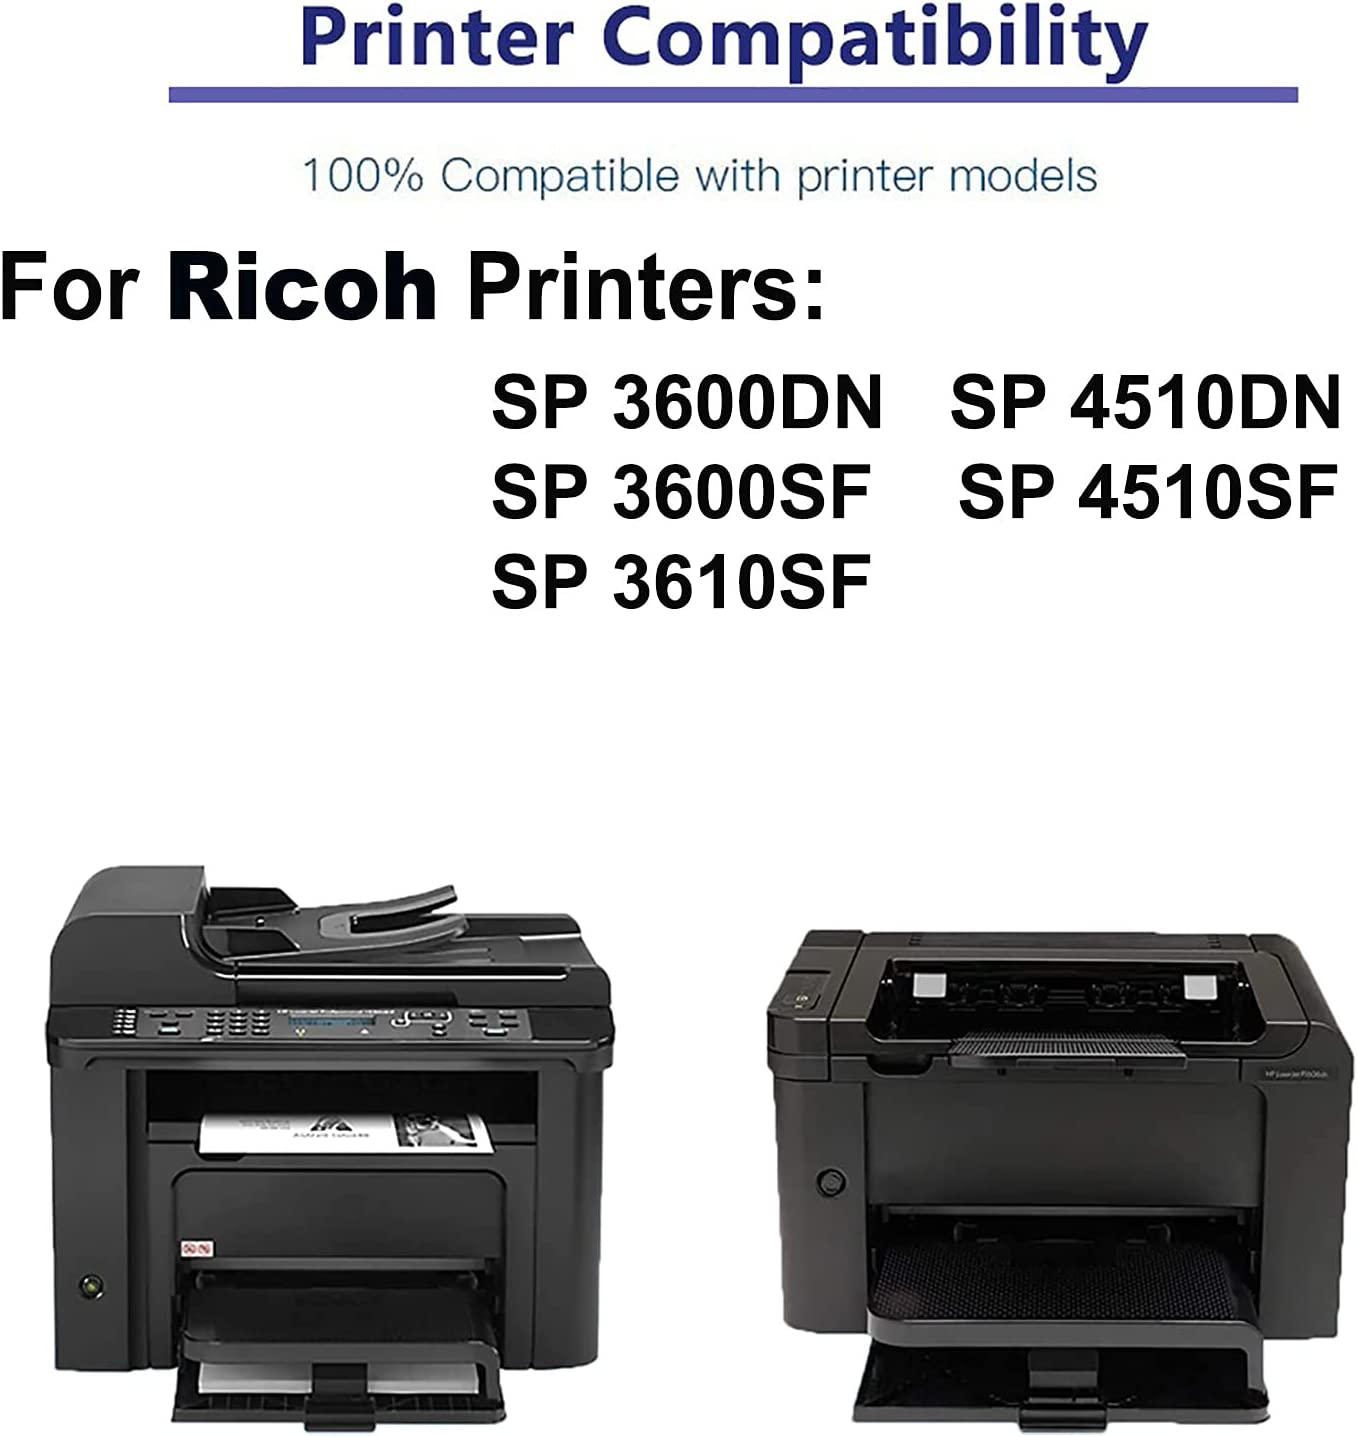 5-Pack Compatible Drum Unit (Black) Replacement for Ricoh 407324 Drum Kit use for Ricoh SP 3600DN, SP 3600SF, SP 3610SF, SP 4510DN, SP 4510SF Printer